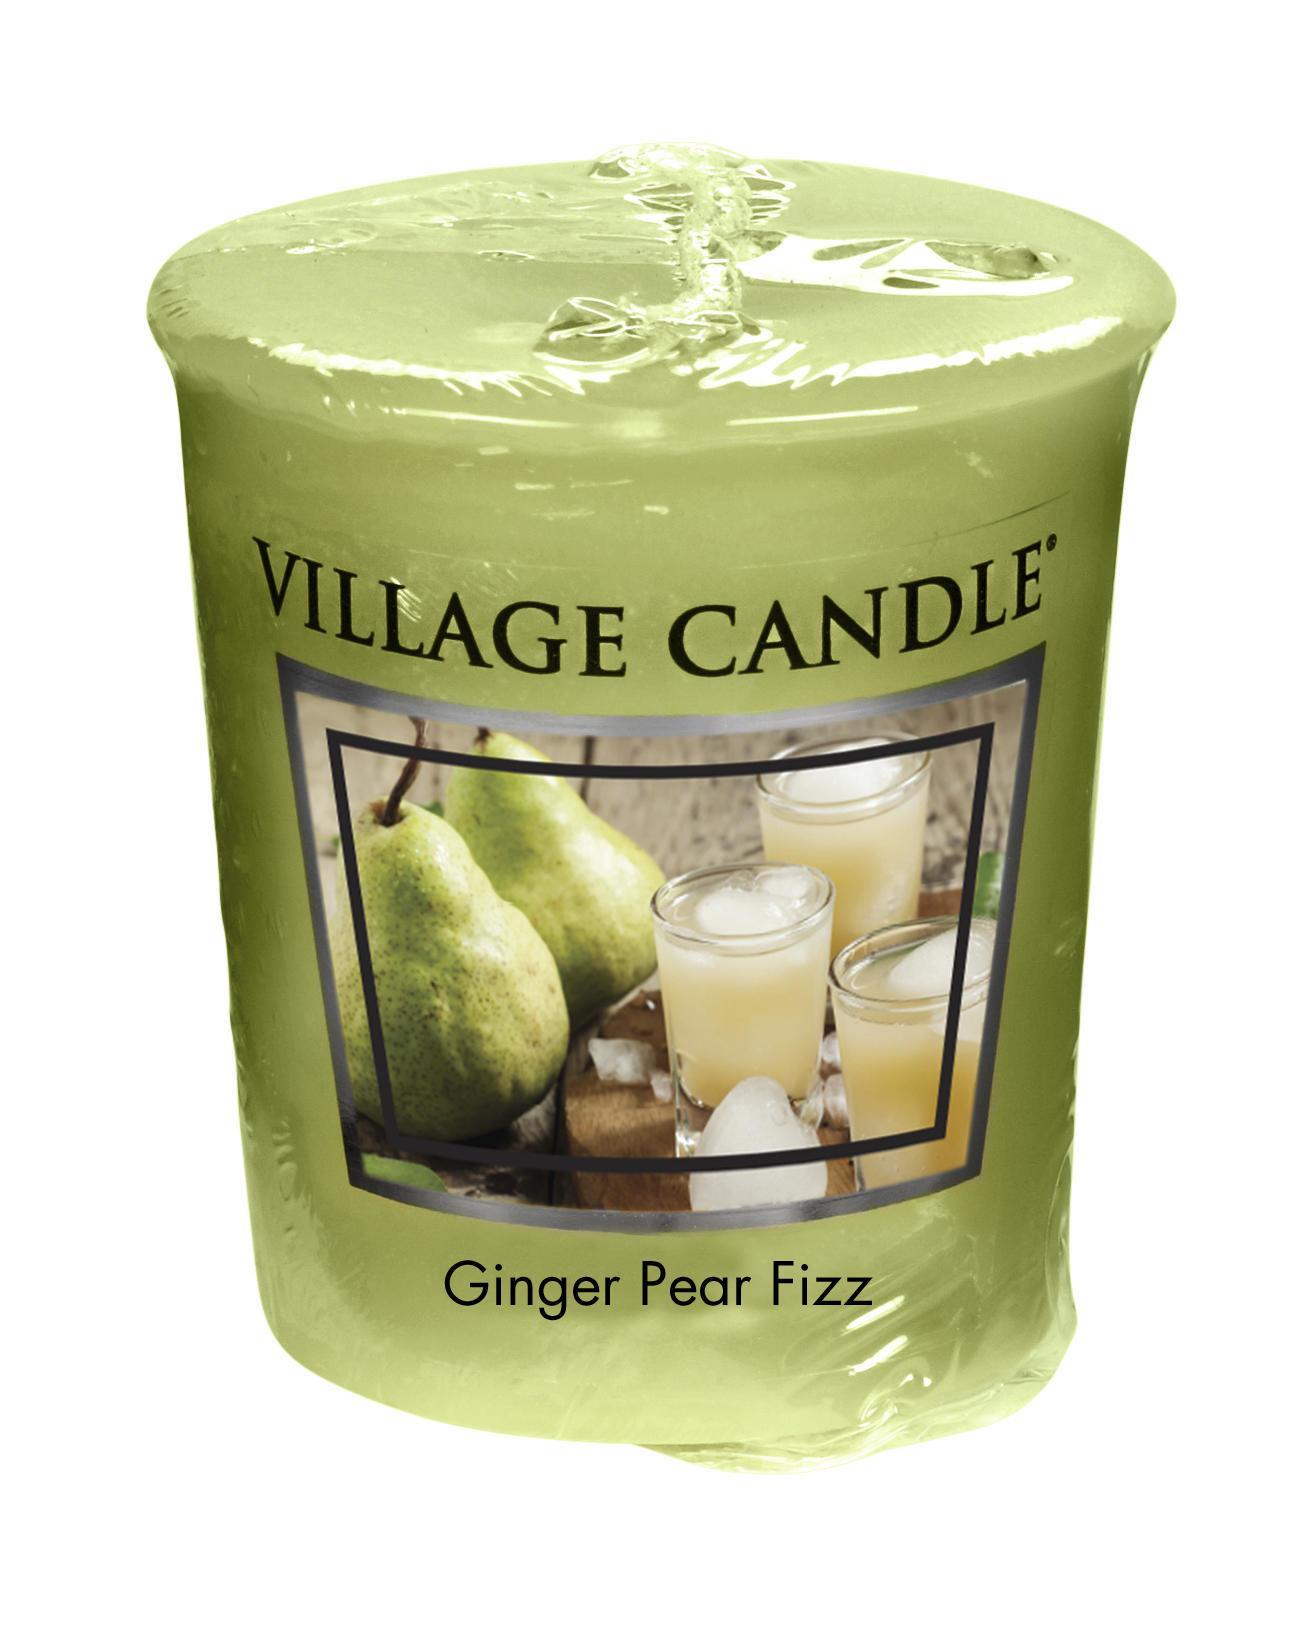 VILLAGE CANDLE Votivní svíčka Village Candle - Ginger Pear Fizz, zelená barva, vosk